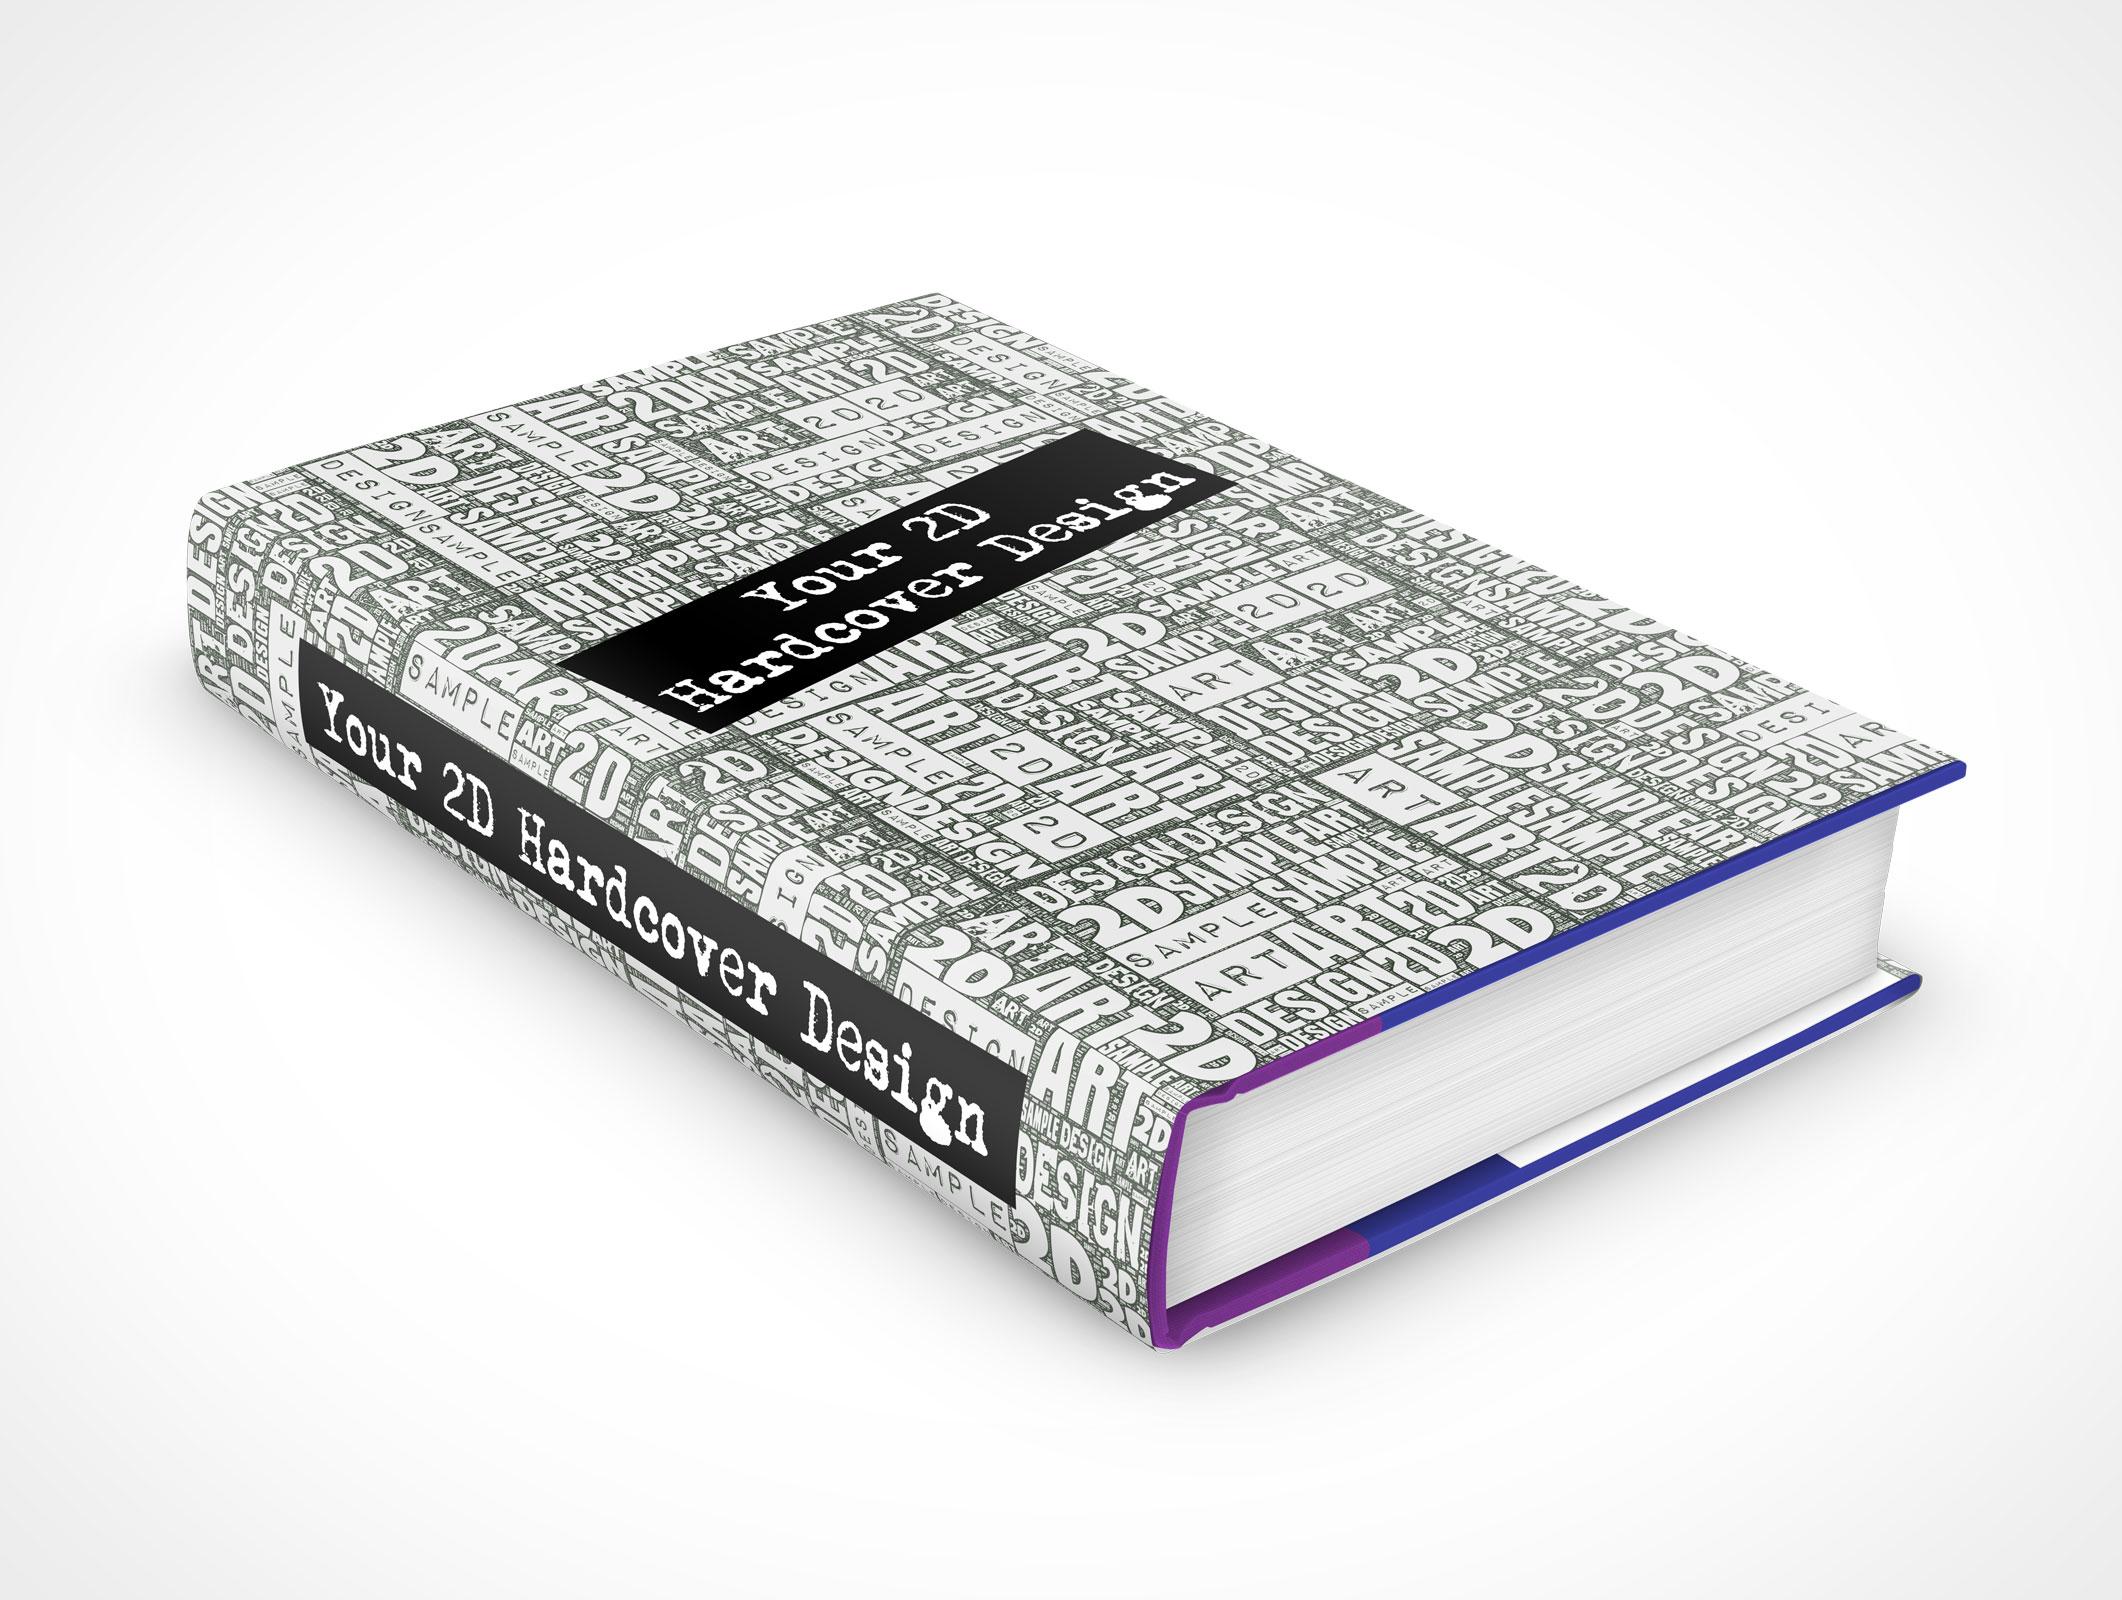 Hardcover Book Mockup Psd Free